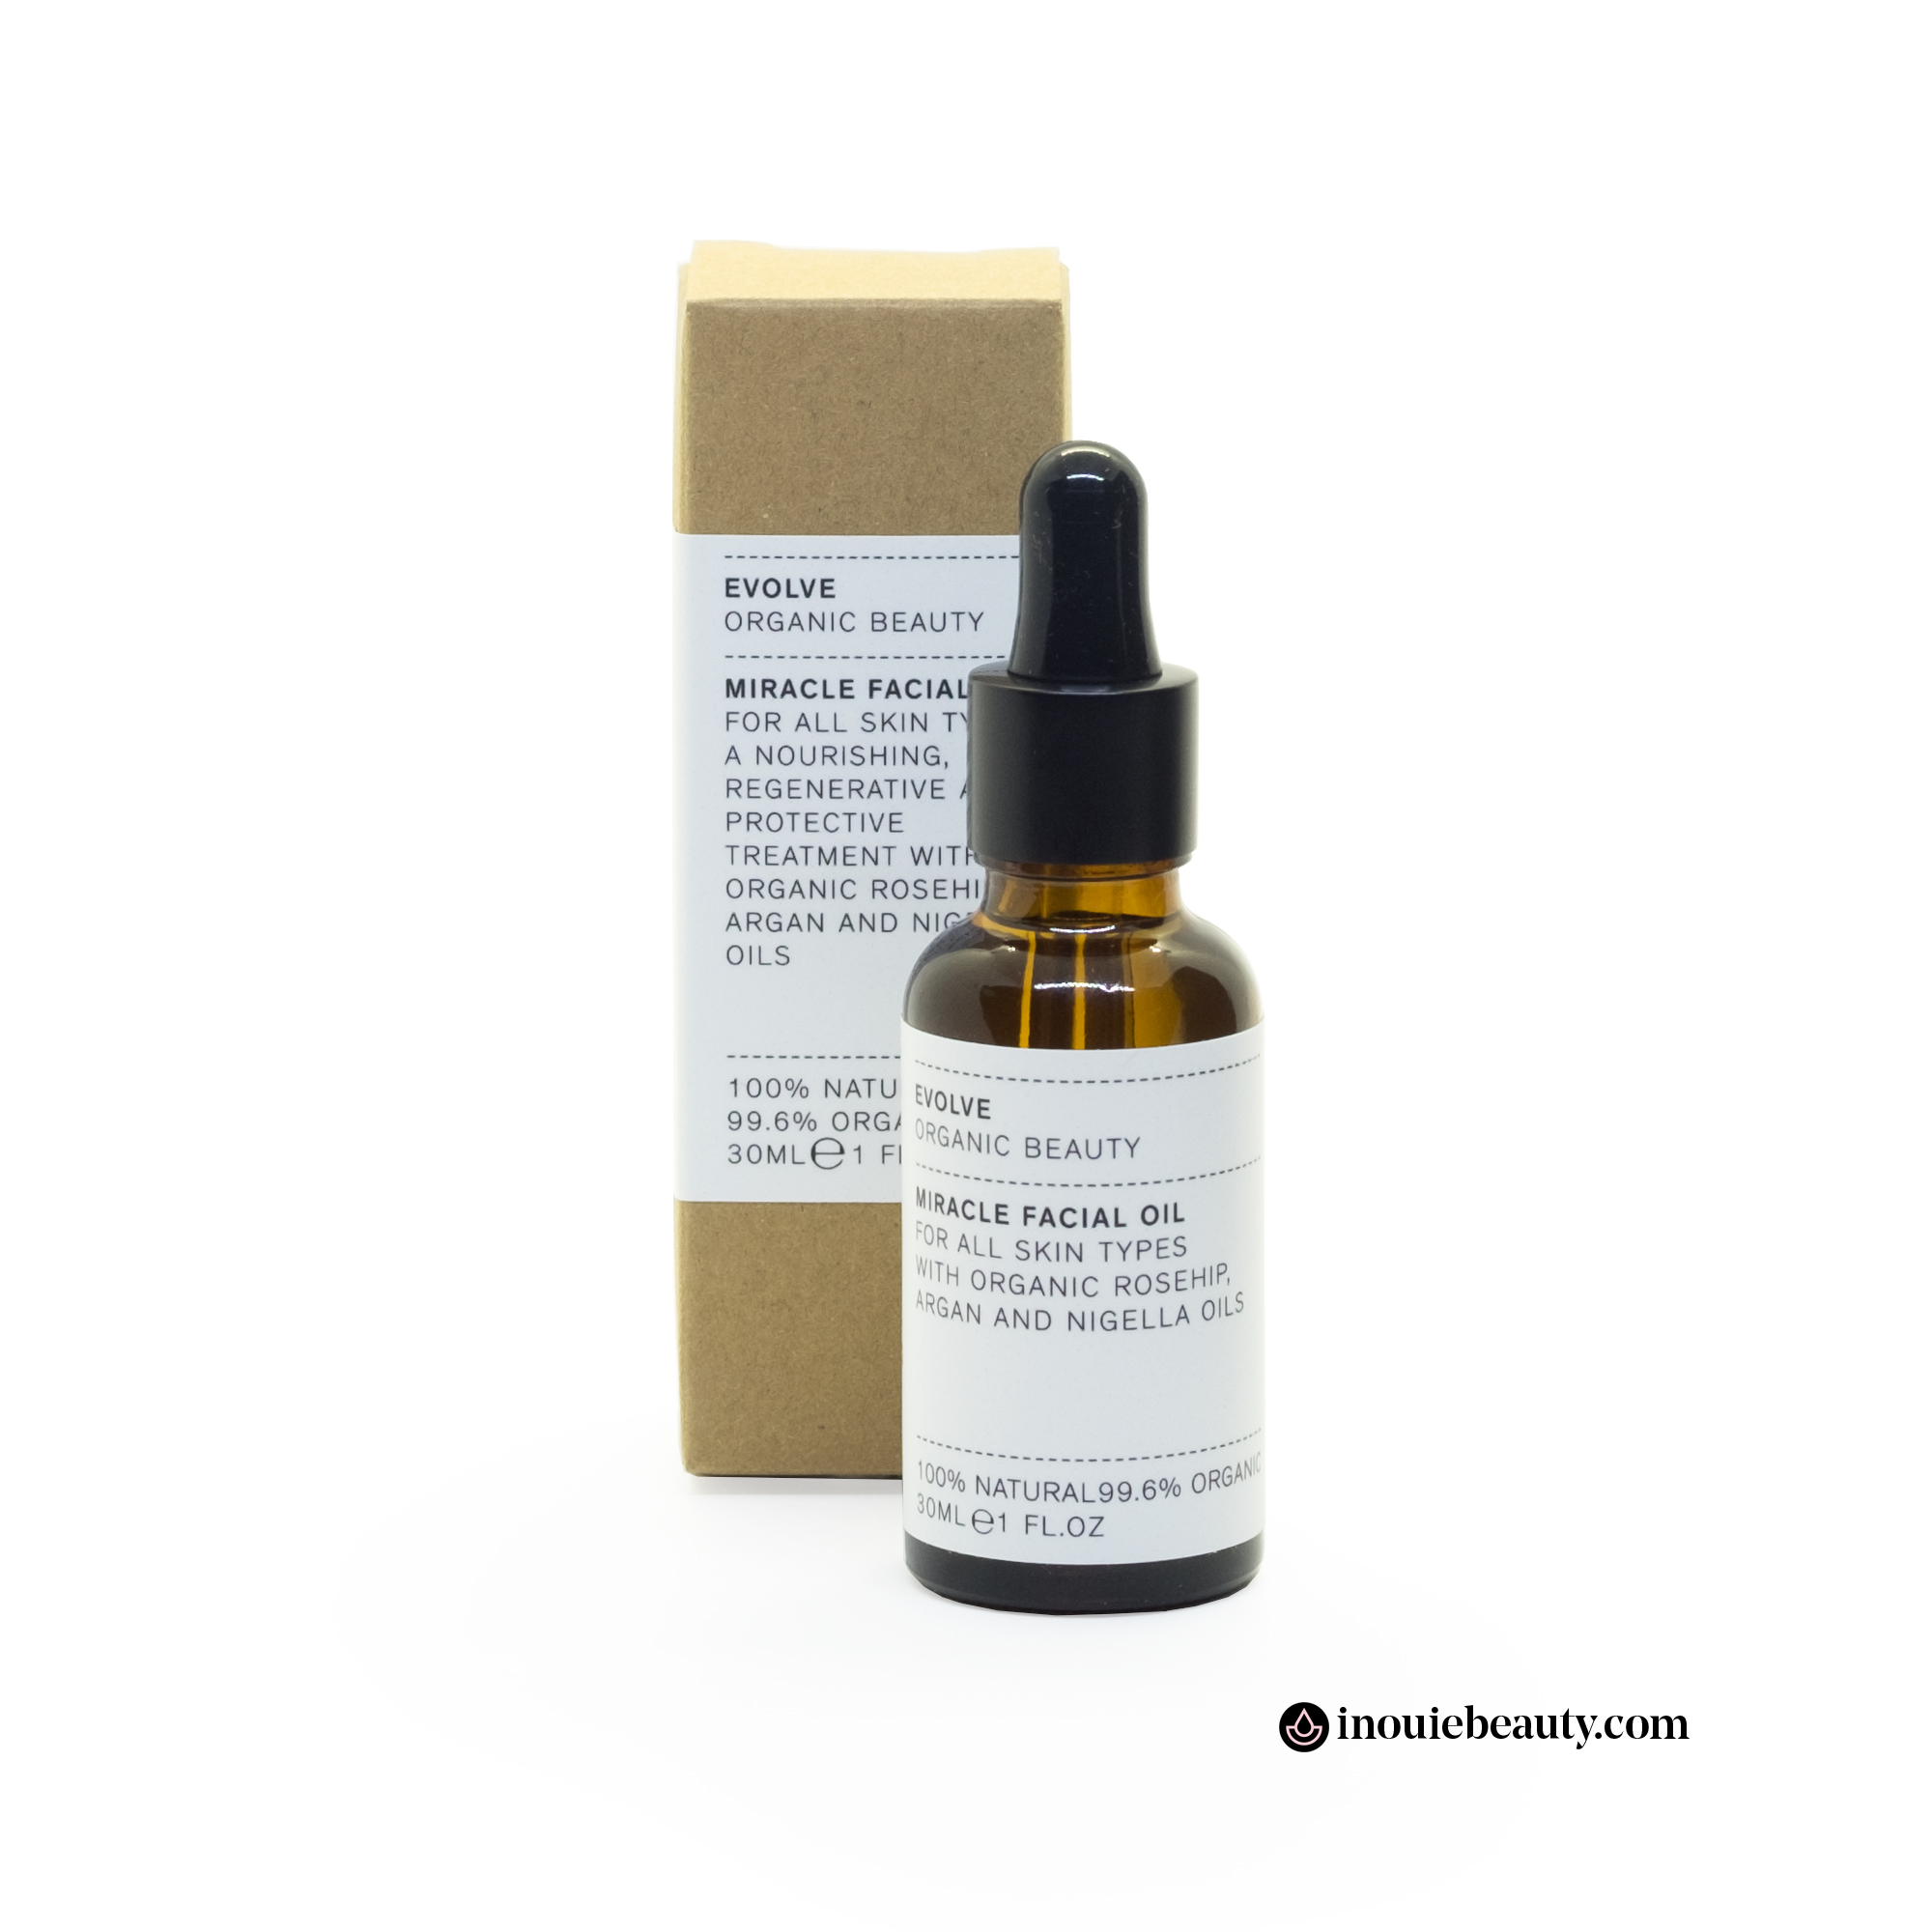 Evolve Miracle Facial Oil